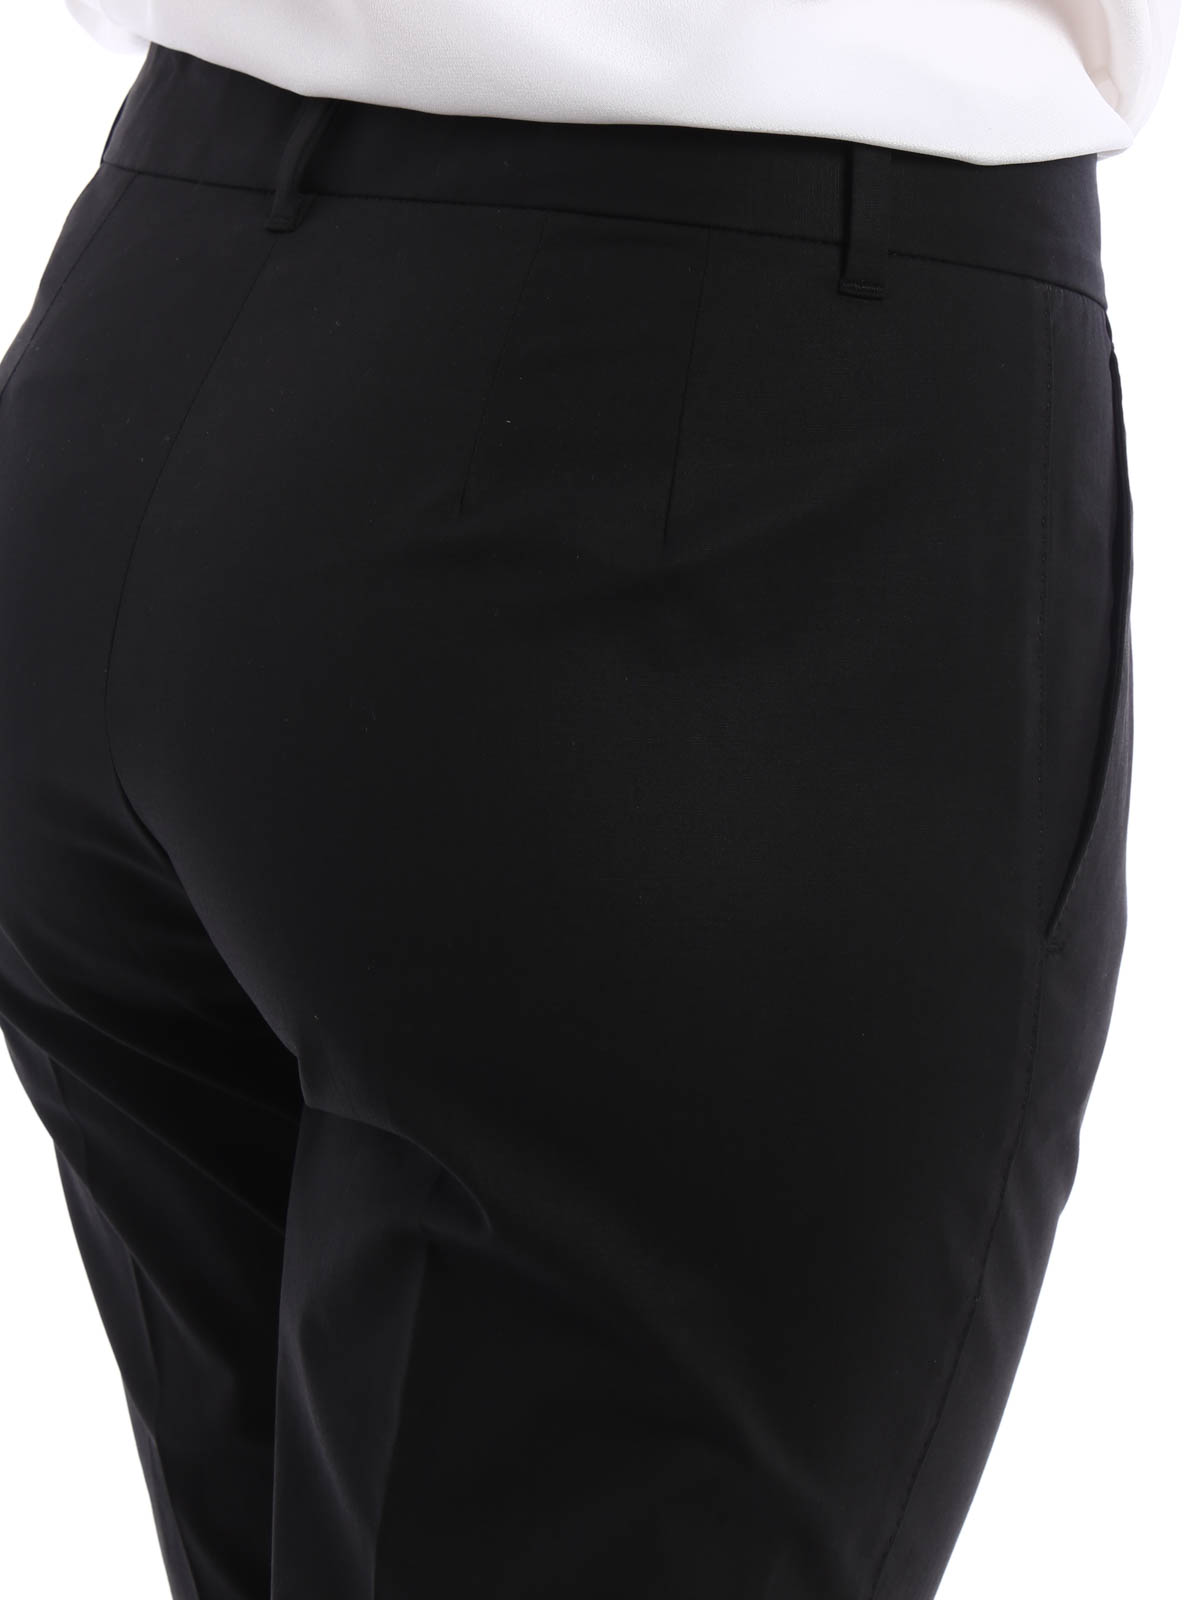 Innovative Emanuel Ungaro Stretchcotton Cigarette Pants In White  Lyst